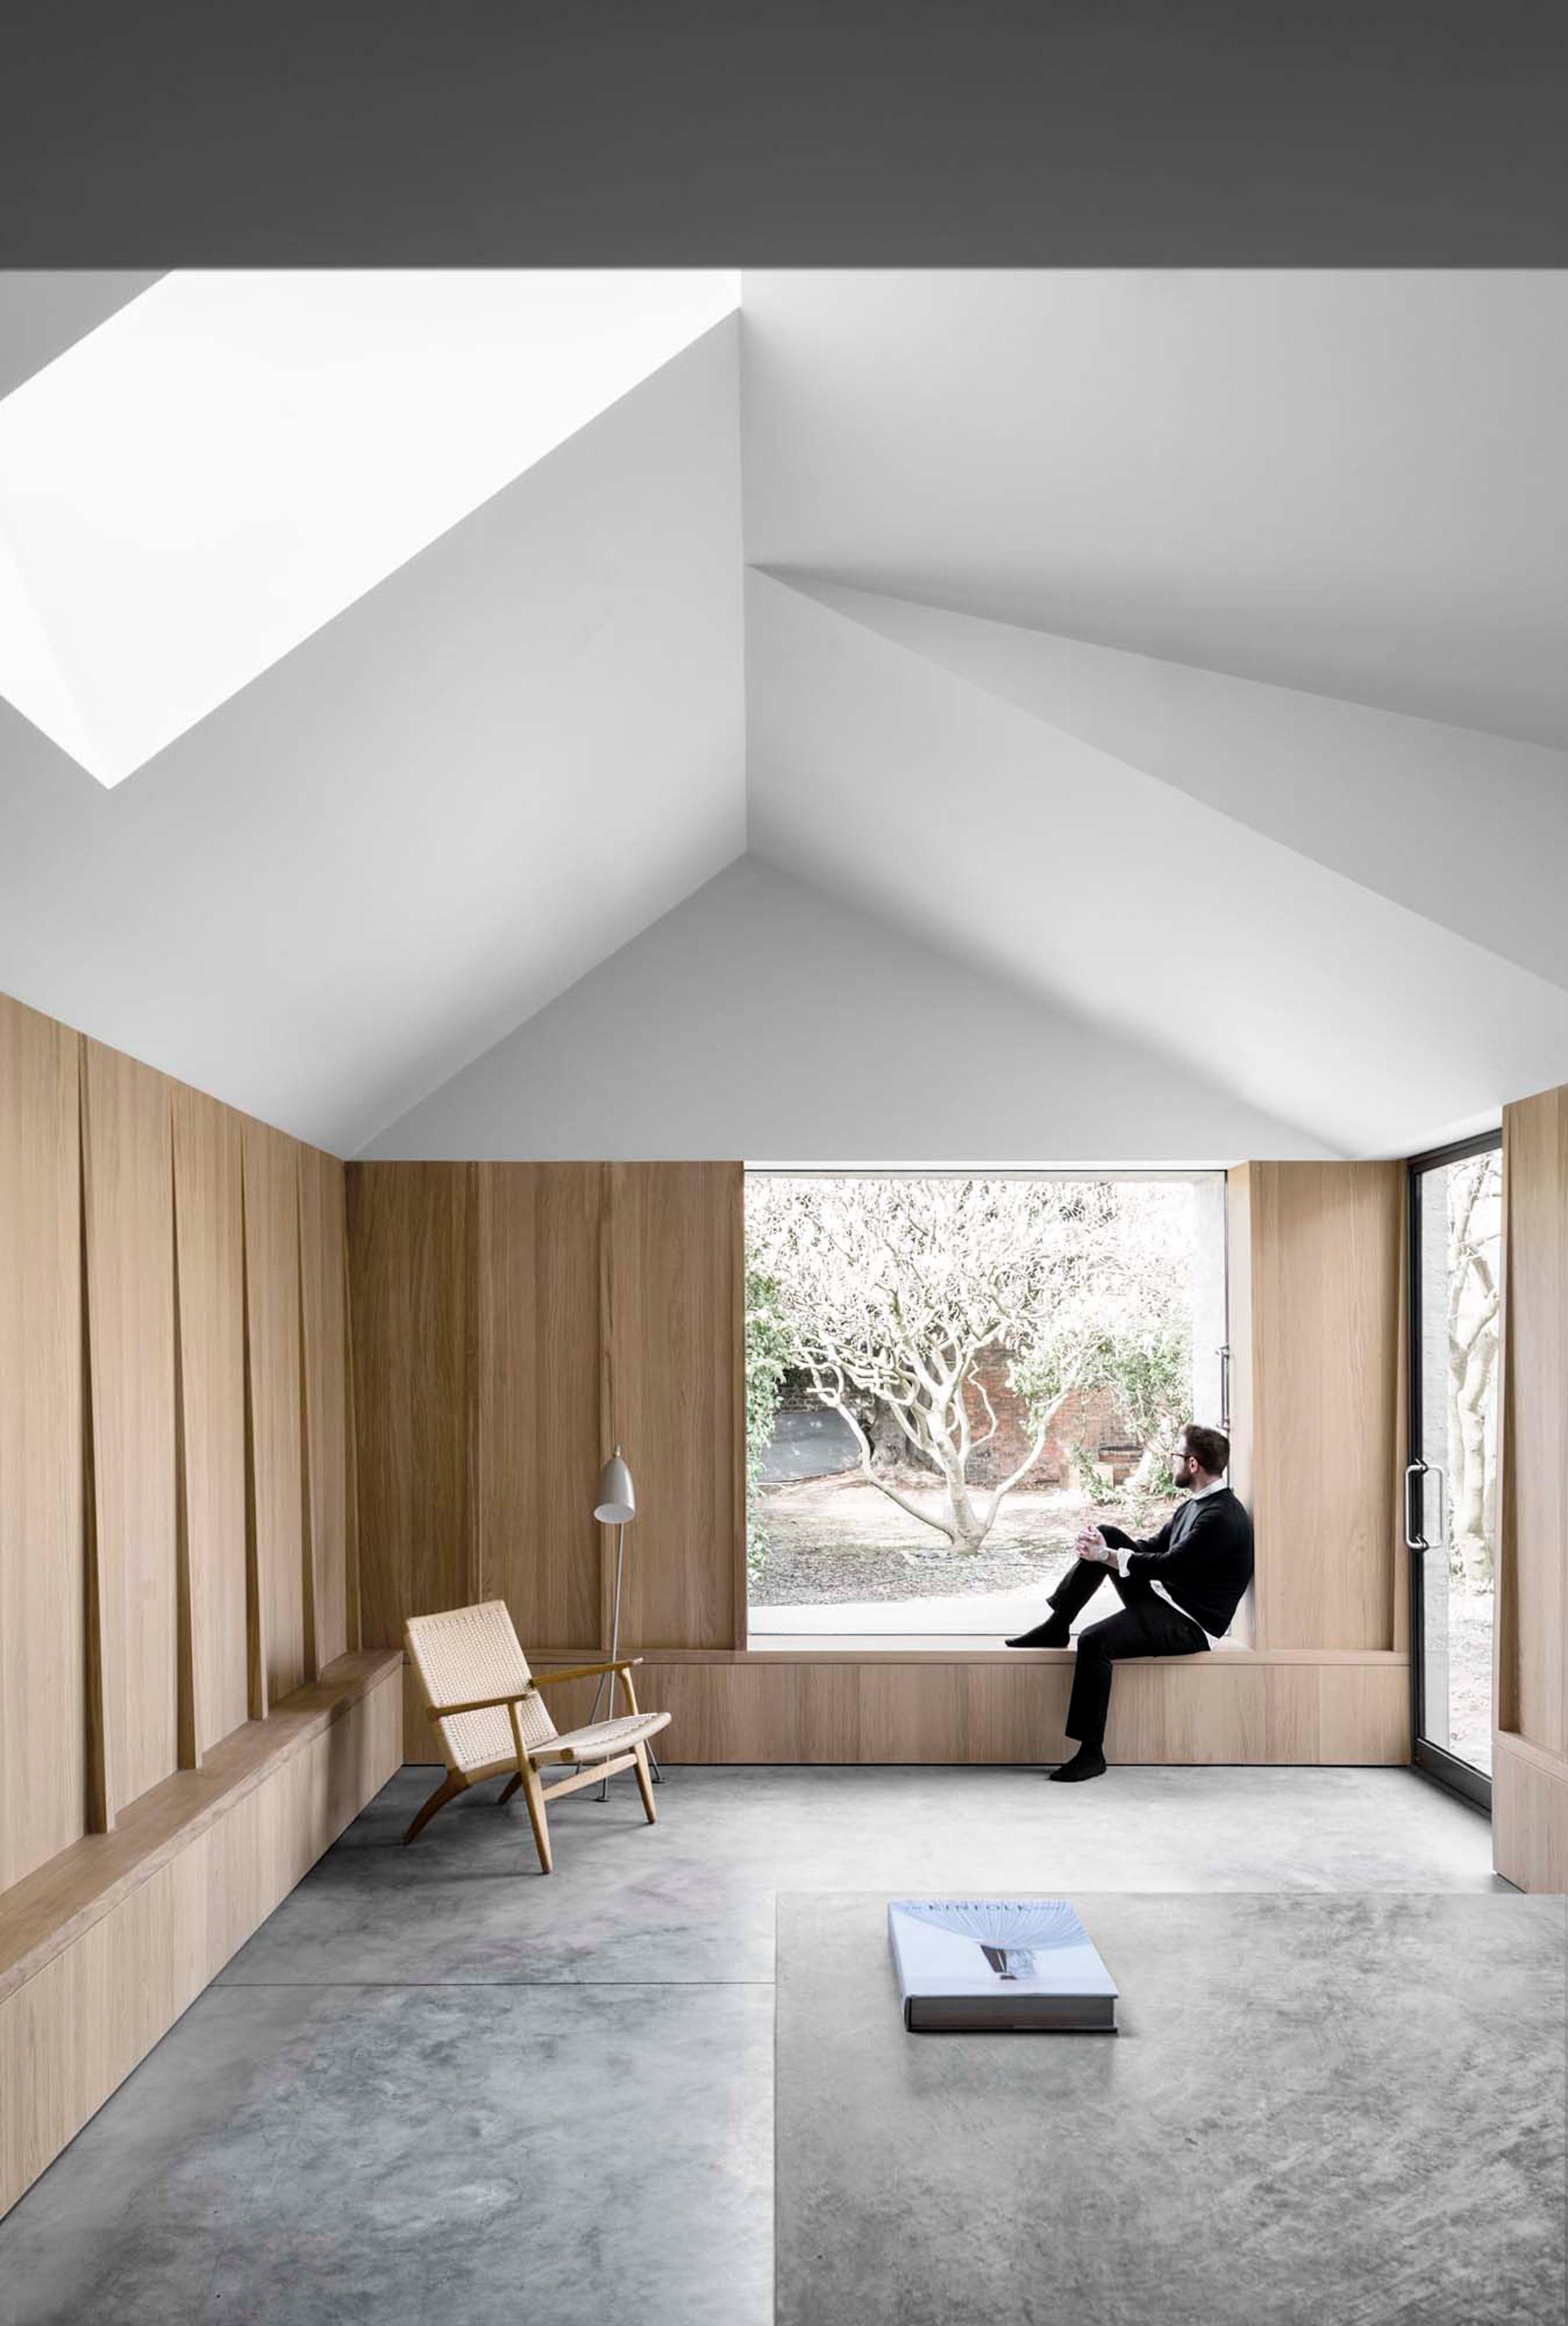 kew-road-mclaren-excell-architecture-residential_dezeen_2364_col_21.jpg